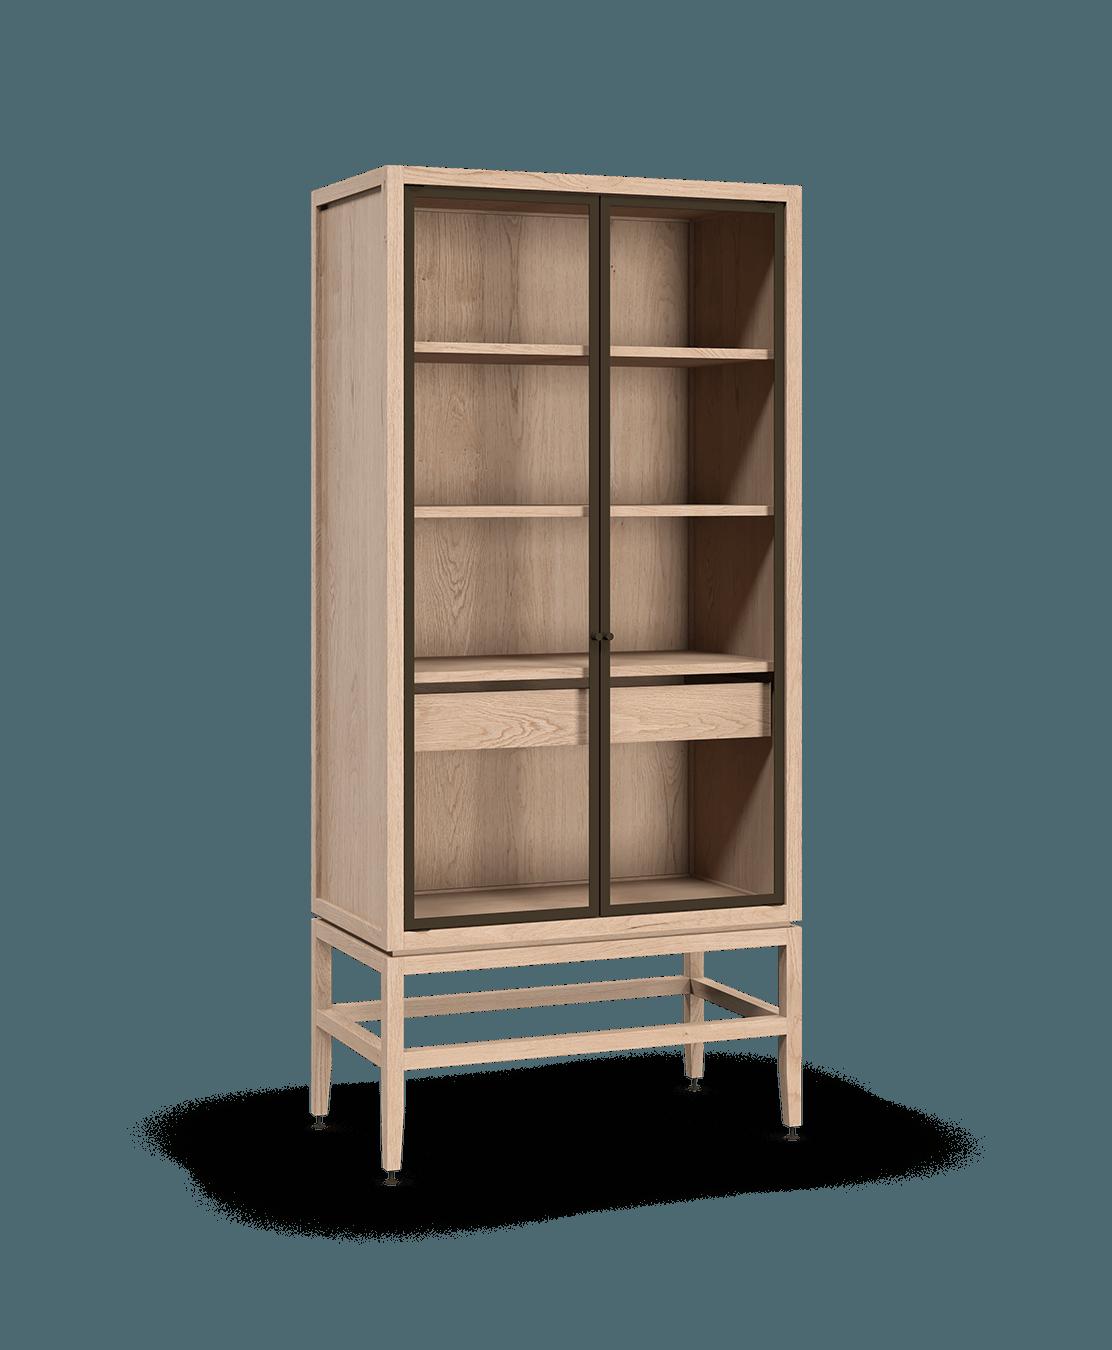 coquo volitare white oak solid wood modular 2 glass doors storage glass display hutch cabinet 33 inch C2-D-3318-1201-NA